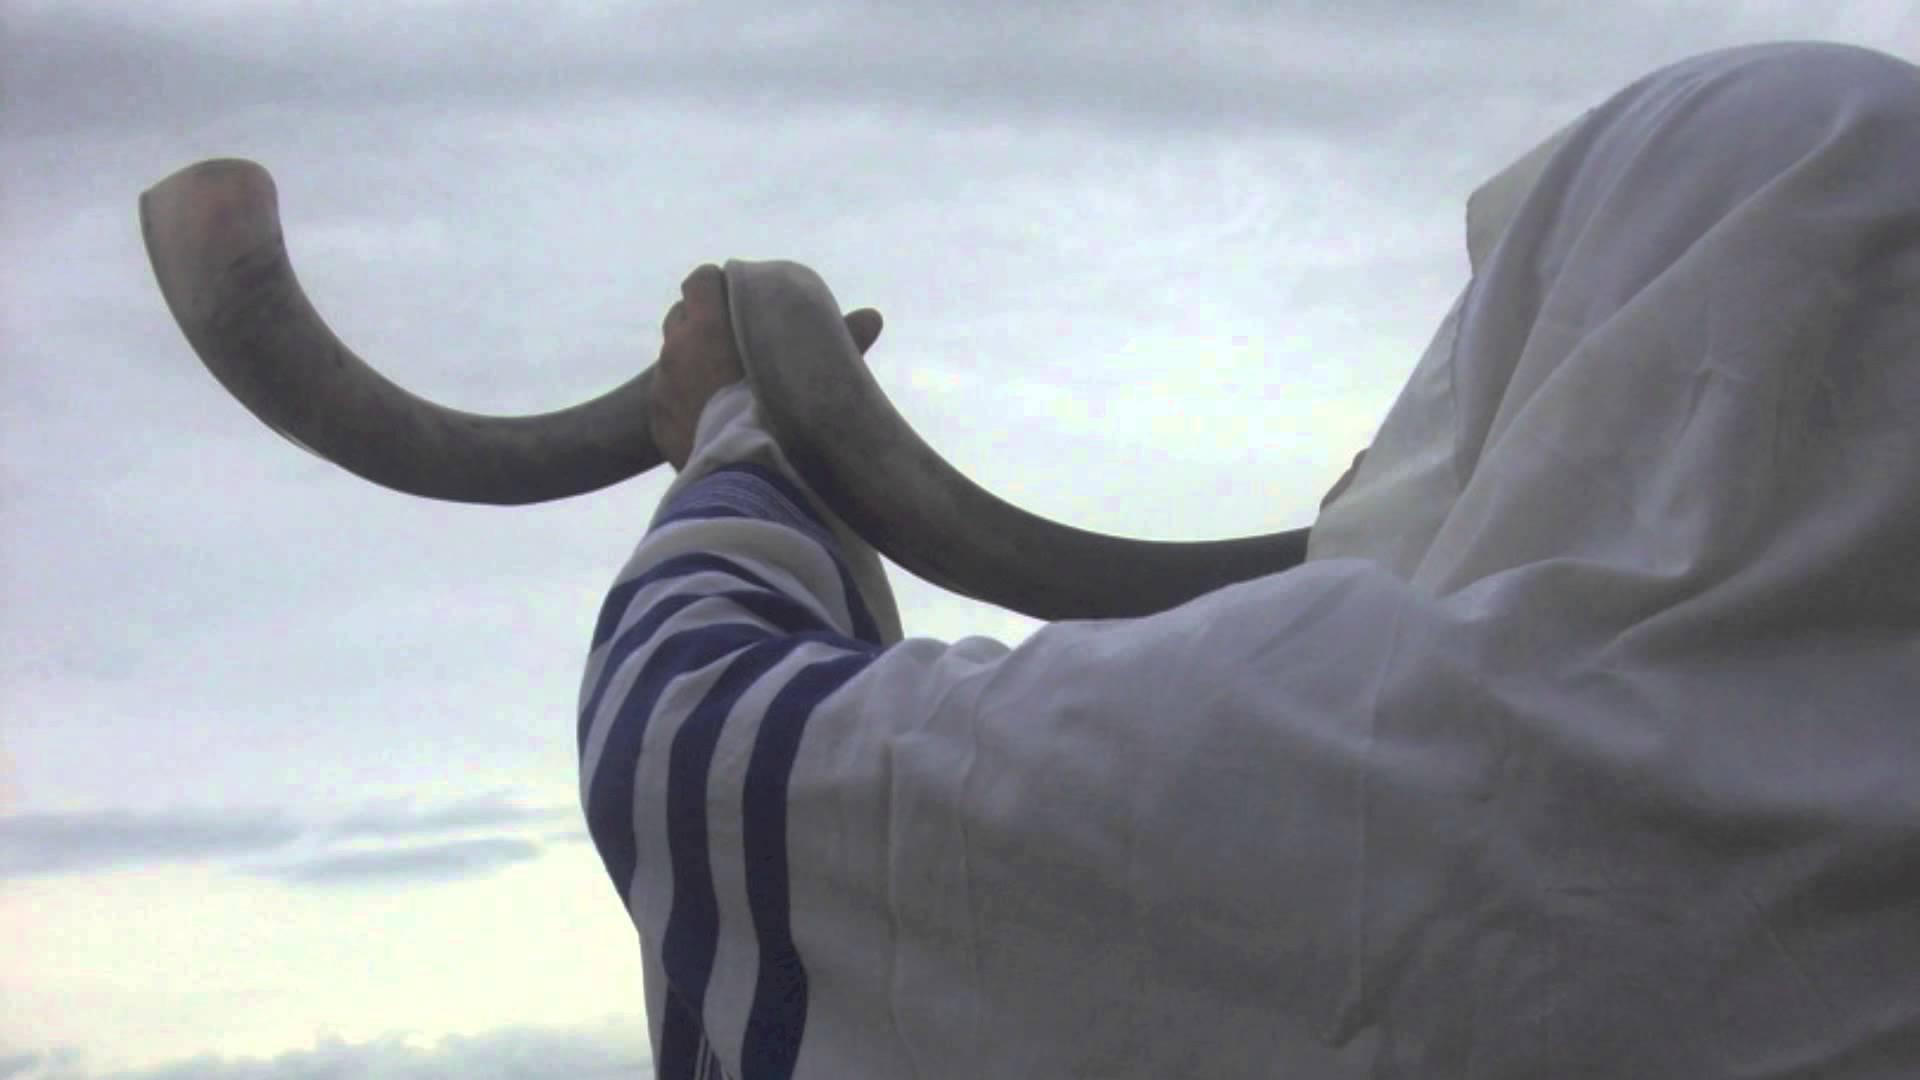 Explications et analyses sur Rosh Hashana. 2. Le Chofar - Par Michel Baruch